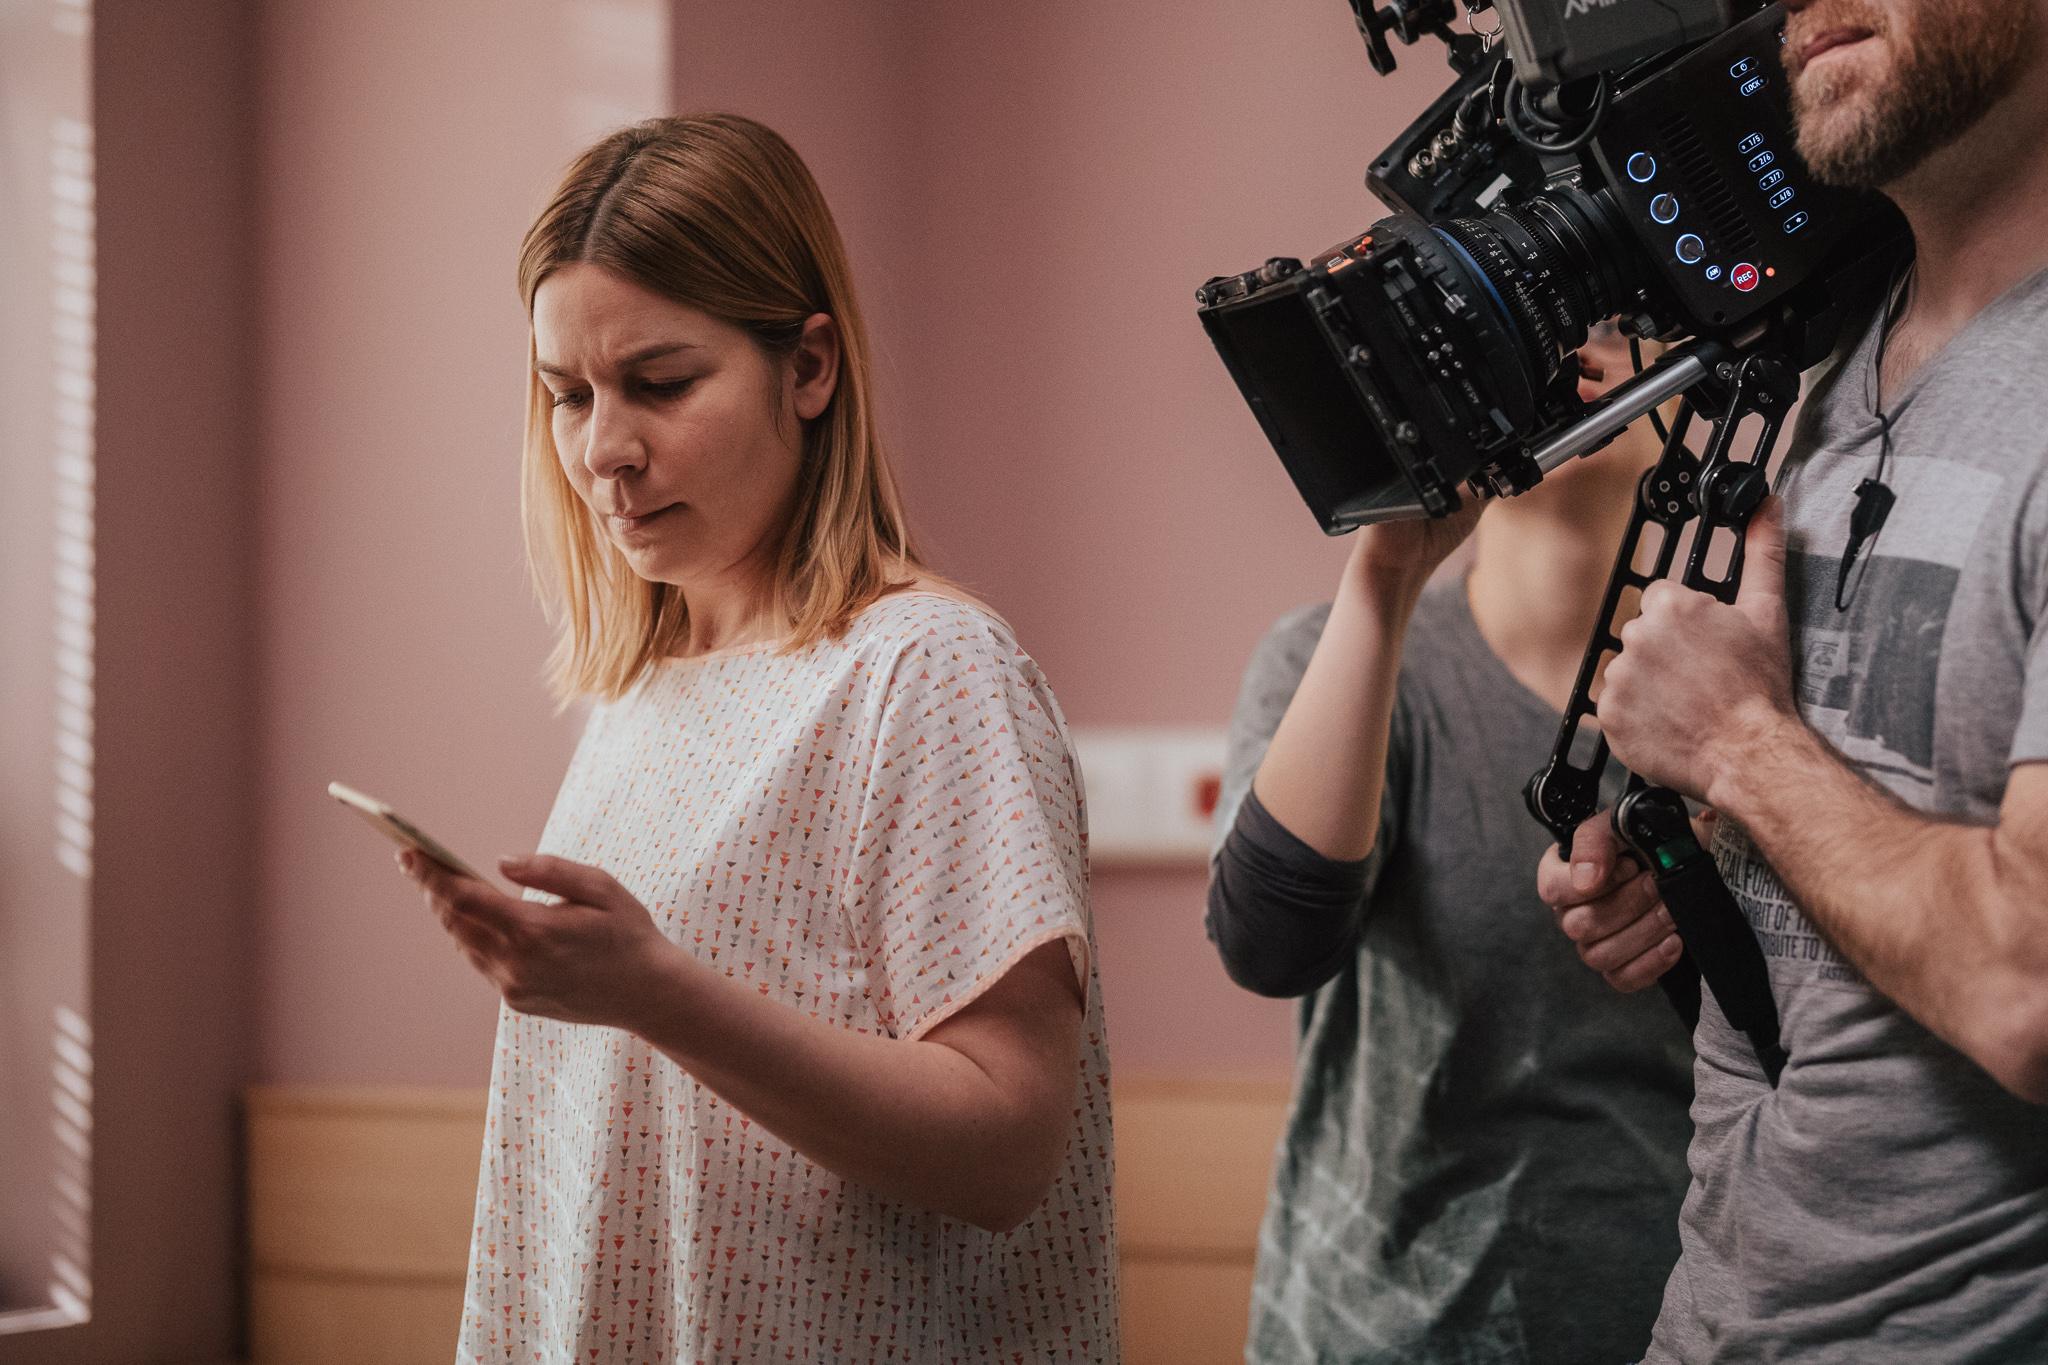 'Reka ljubezni' season 2 (2018)    Production: Perfo    Director: Nejc Levstik    DOP: Peter Prevec    In frame: Ana Urbanc